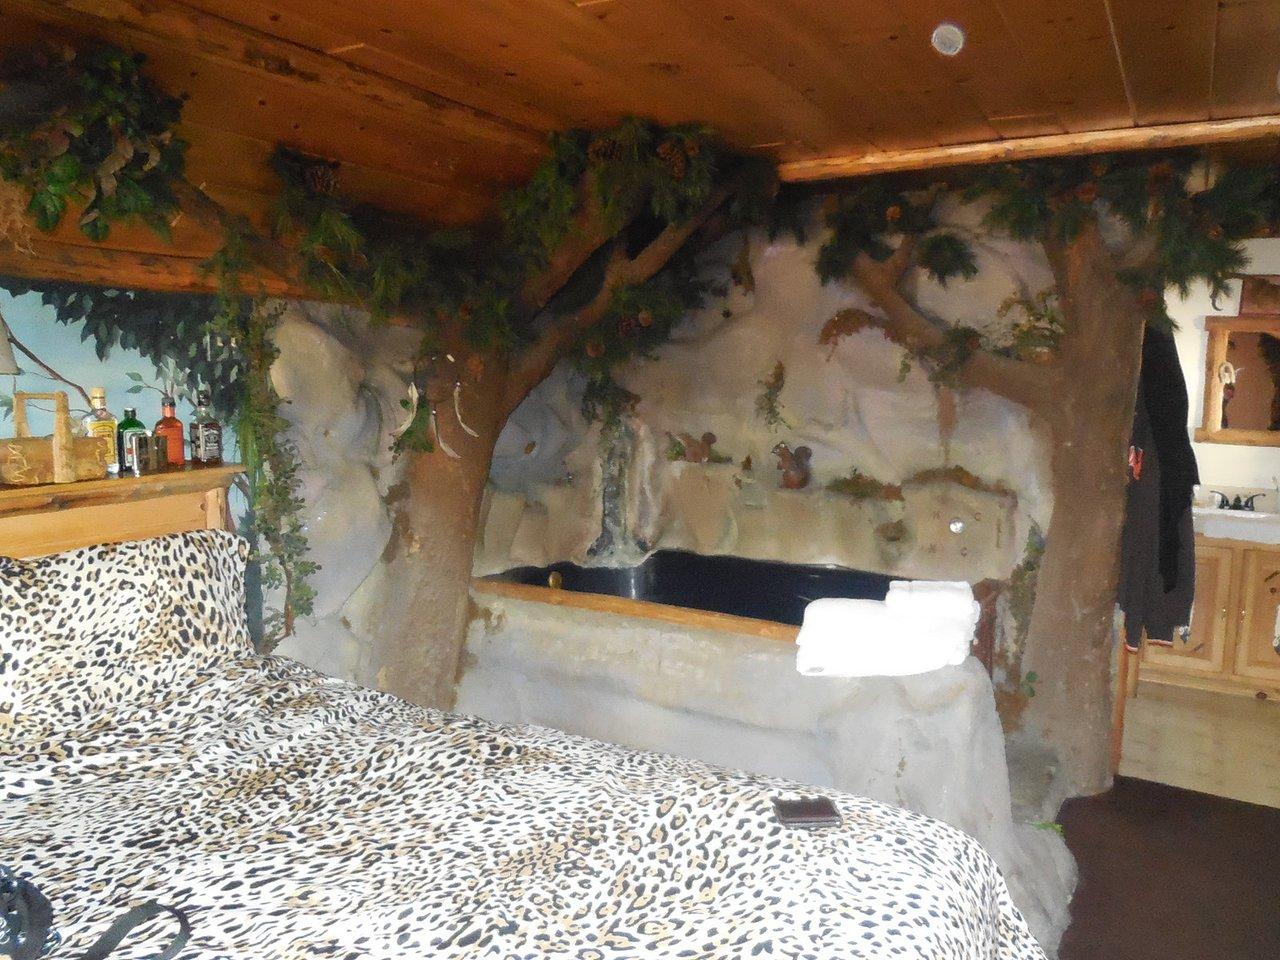 castle wood cottages prices cottage reviews big bear region ca rh tripadvisor com castlewood cottages big bear lake